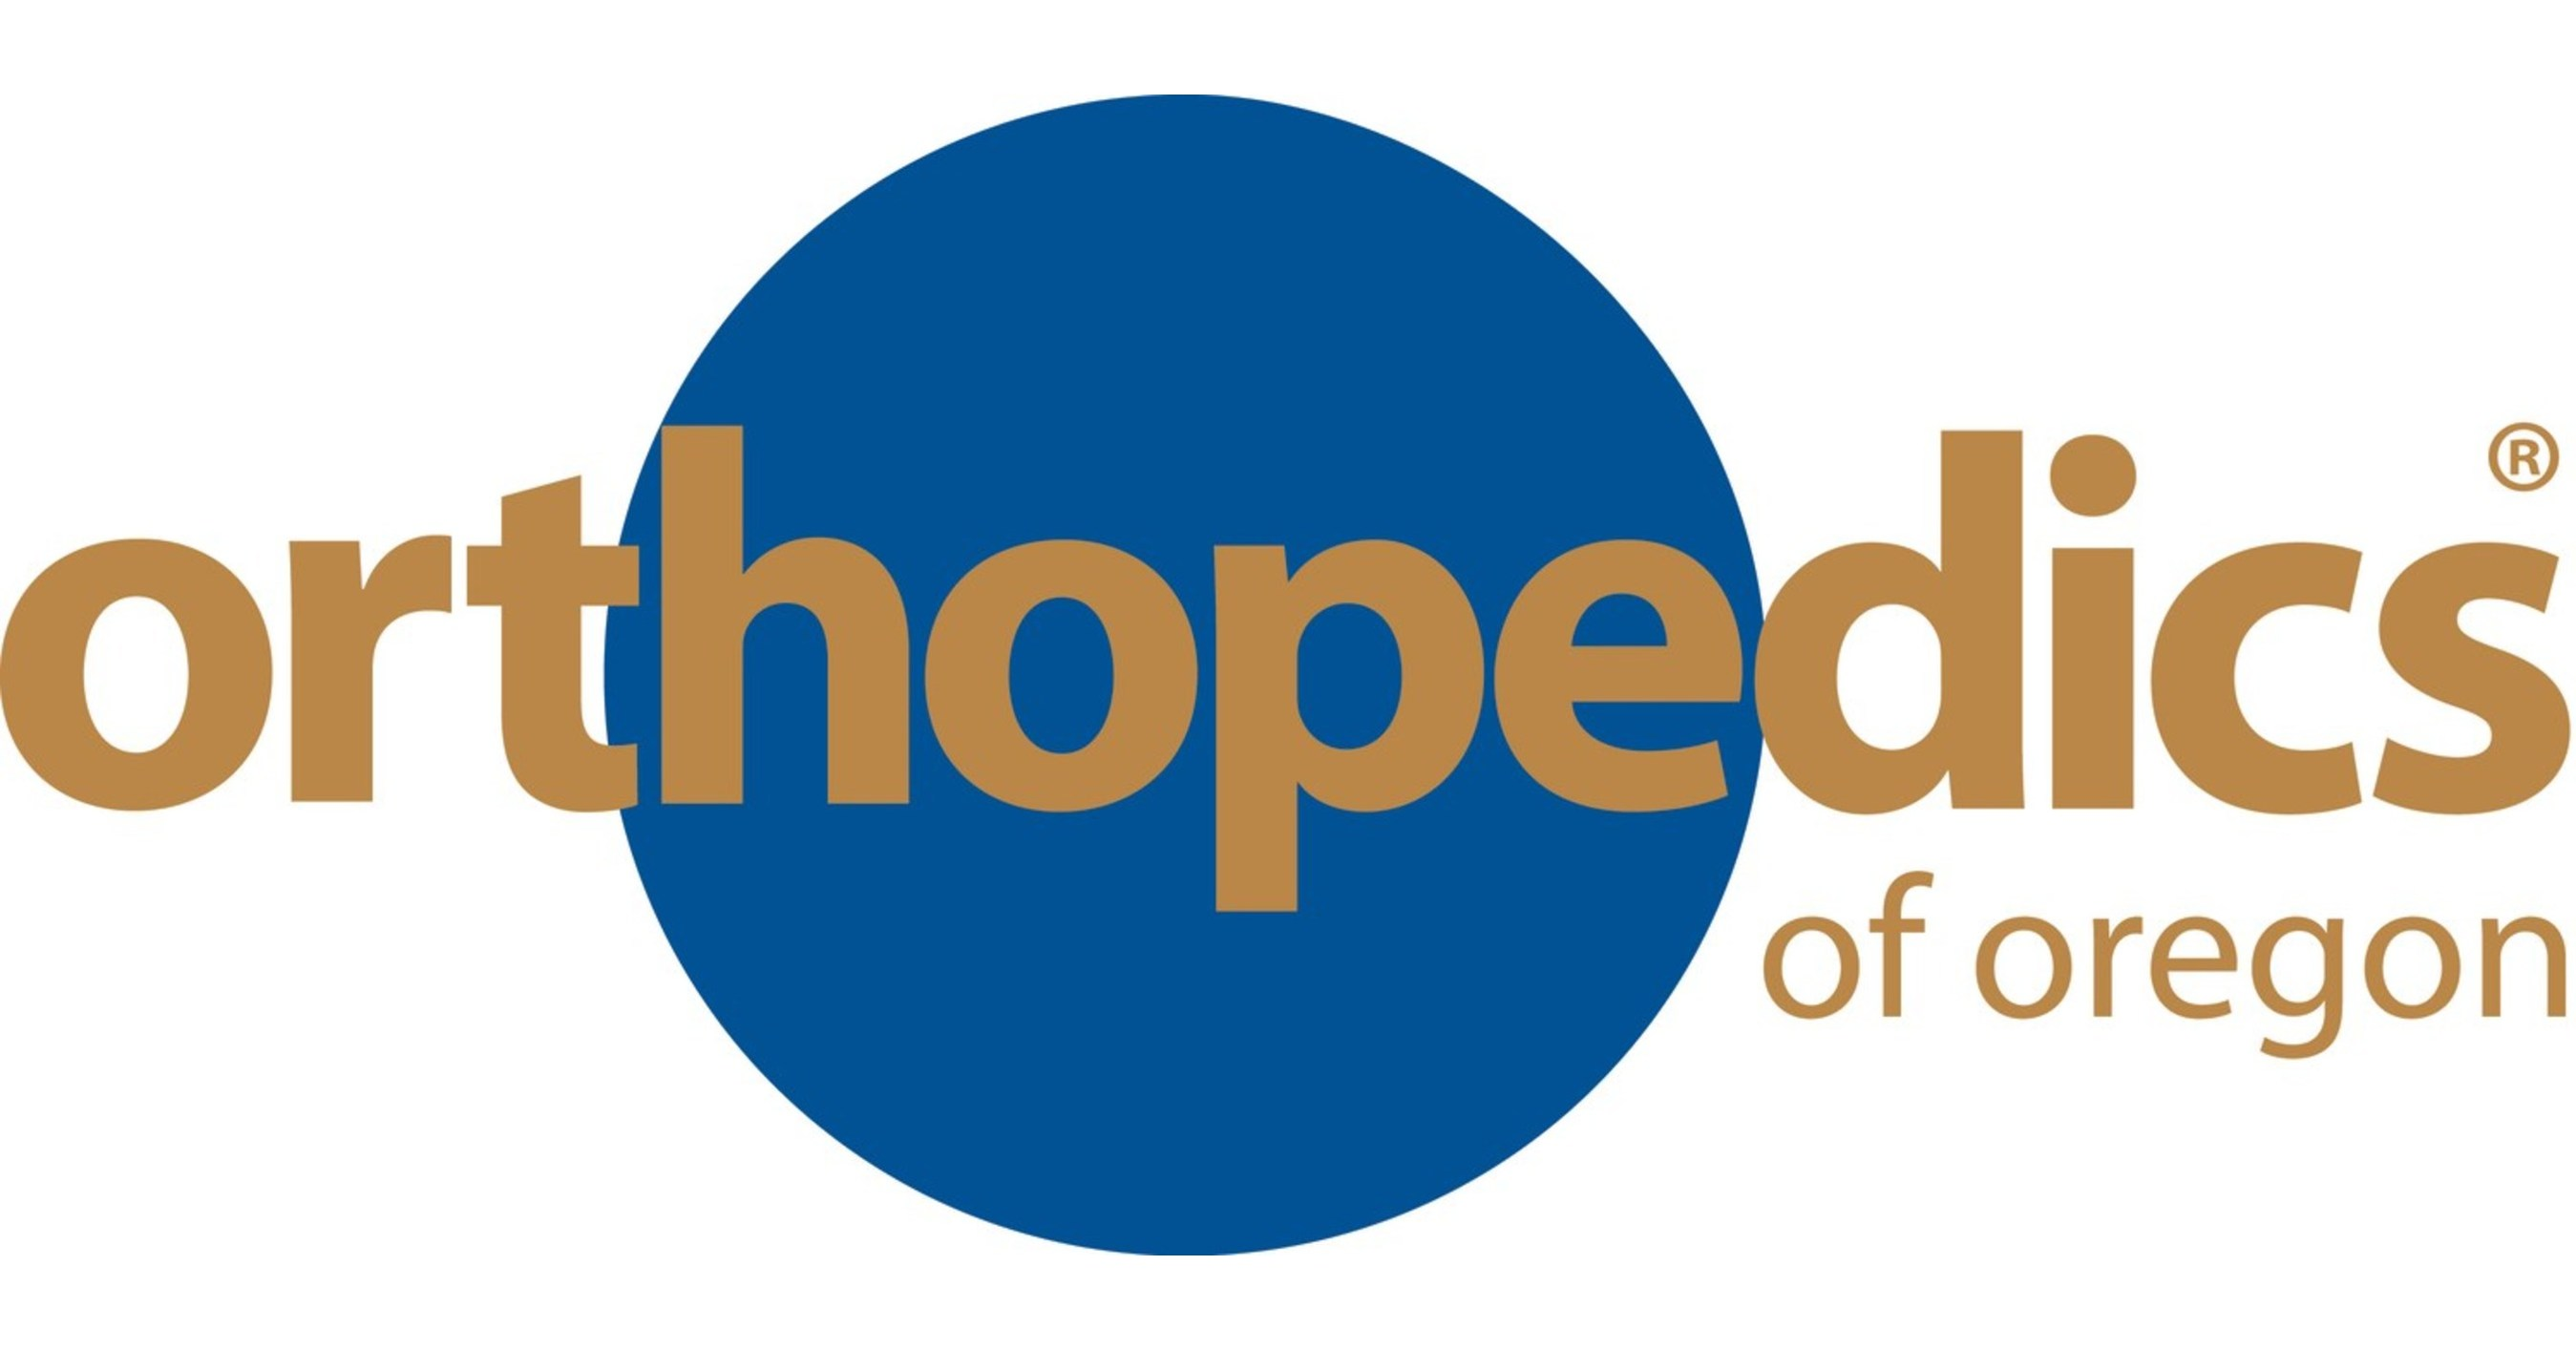 Building the Future: Hope Orthopedics selects Dr. Shane Hess - PRNewswire